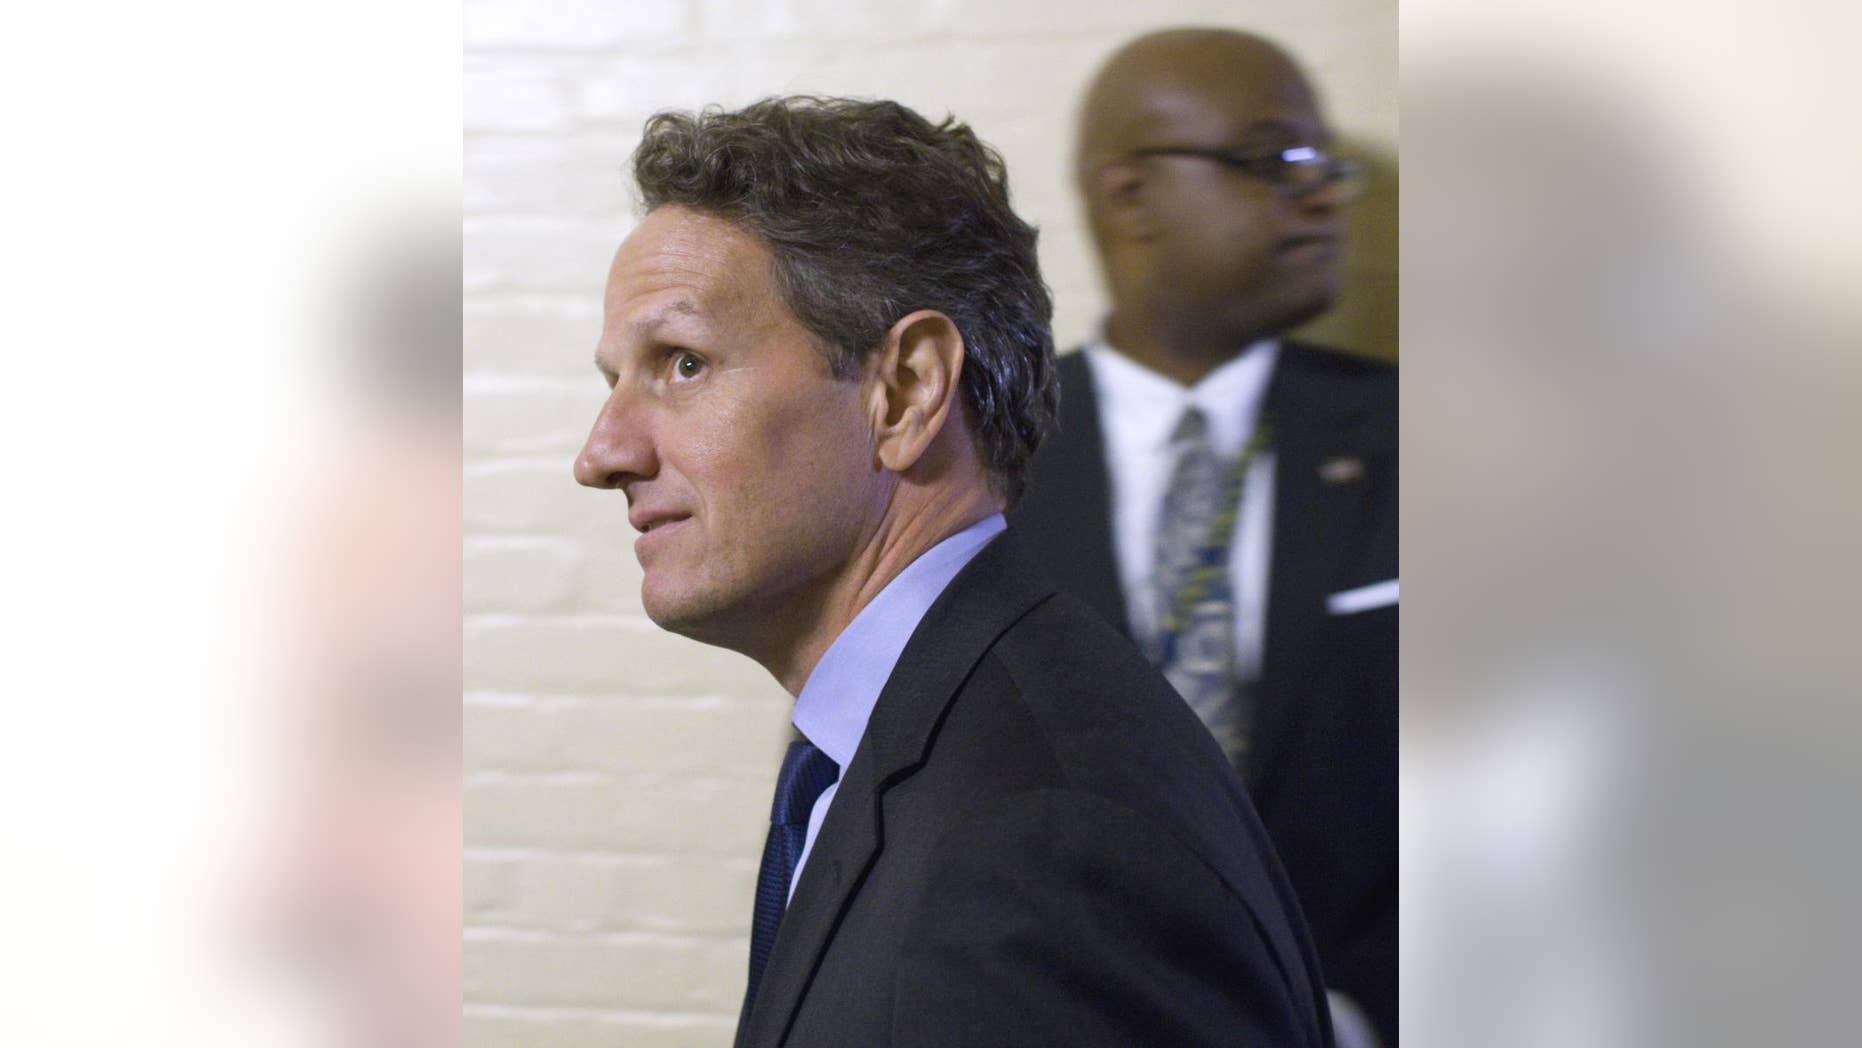 Treasury Secretary Timothy Geithner arrives for a House GOP freshman caucus meeting on Capitol Hill in Washington, Thursday, June 2, 2011. (AP Photo/Harry Hamburg)